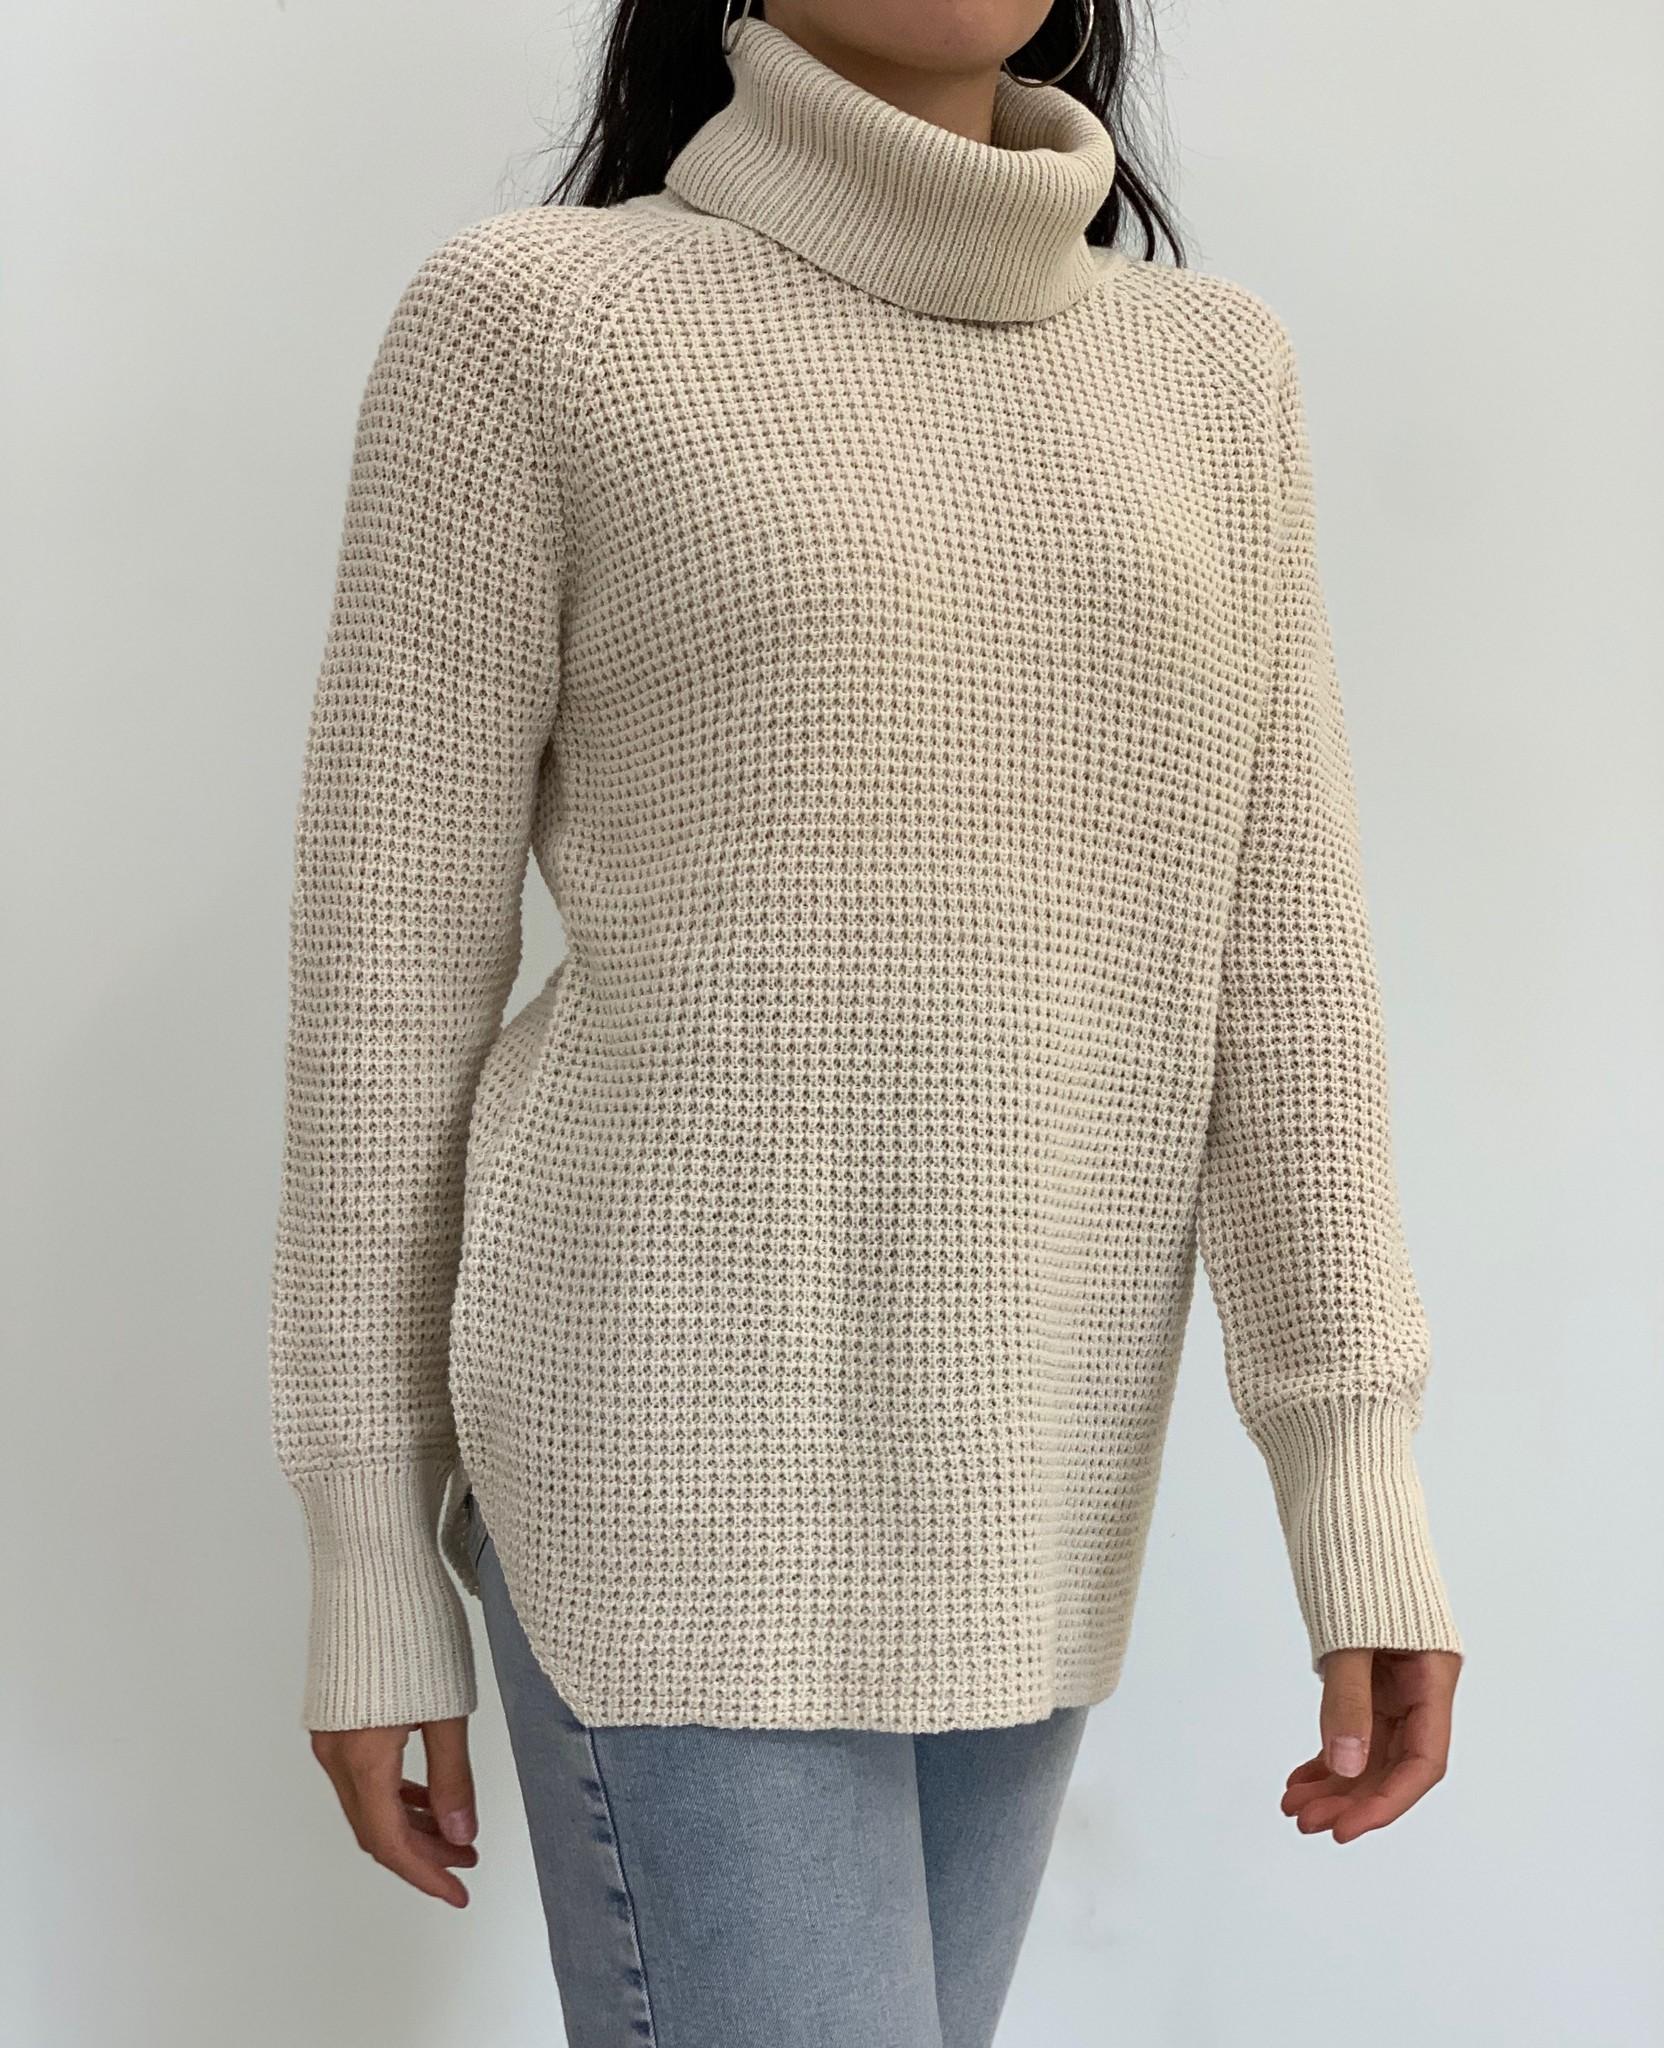 rd style - knit turtleneck